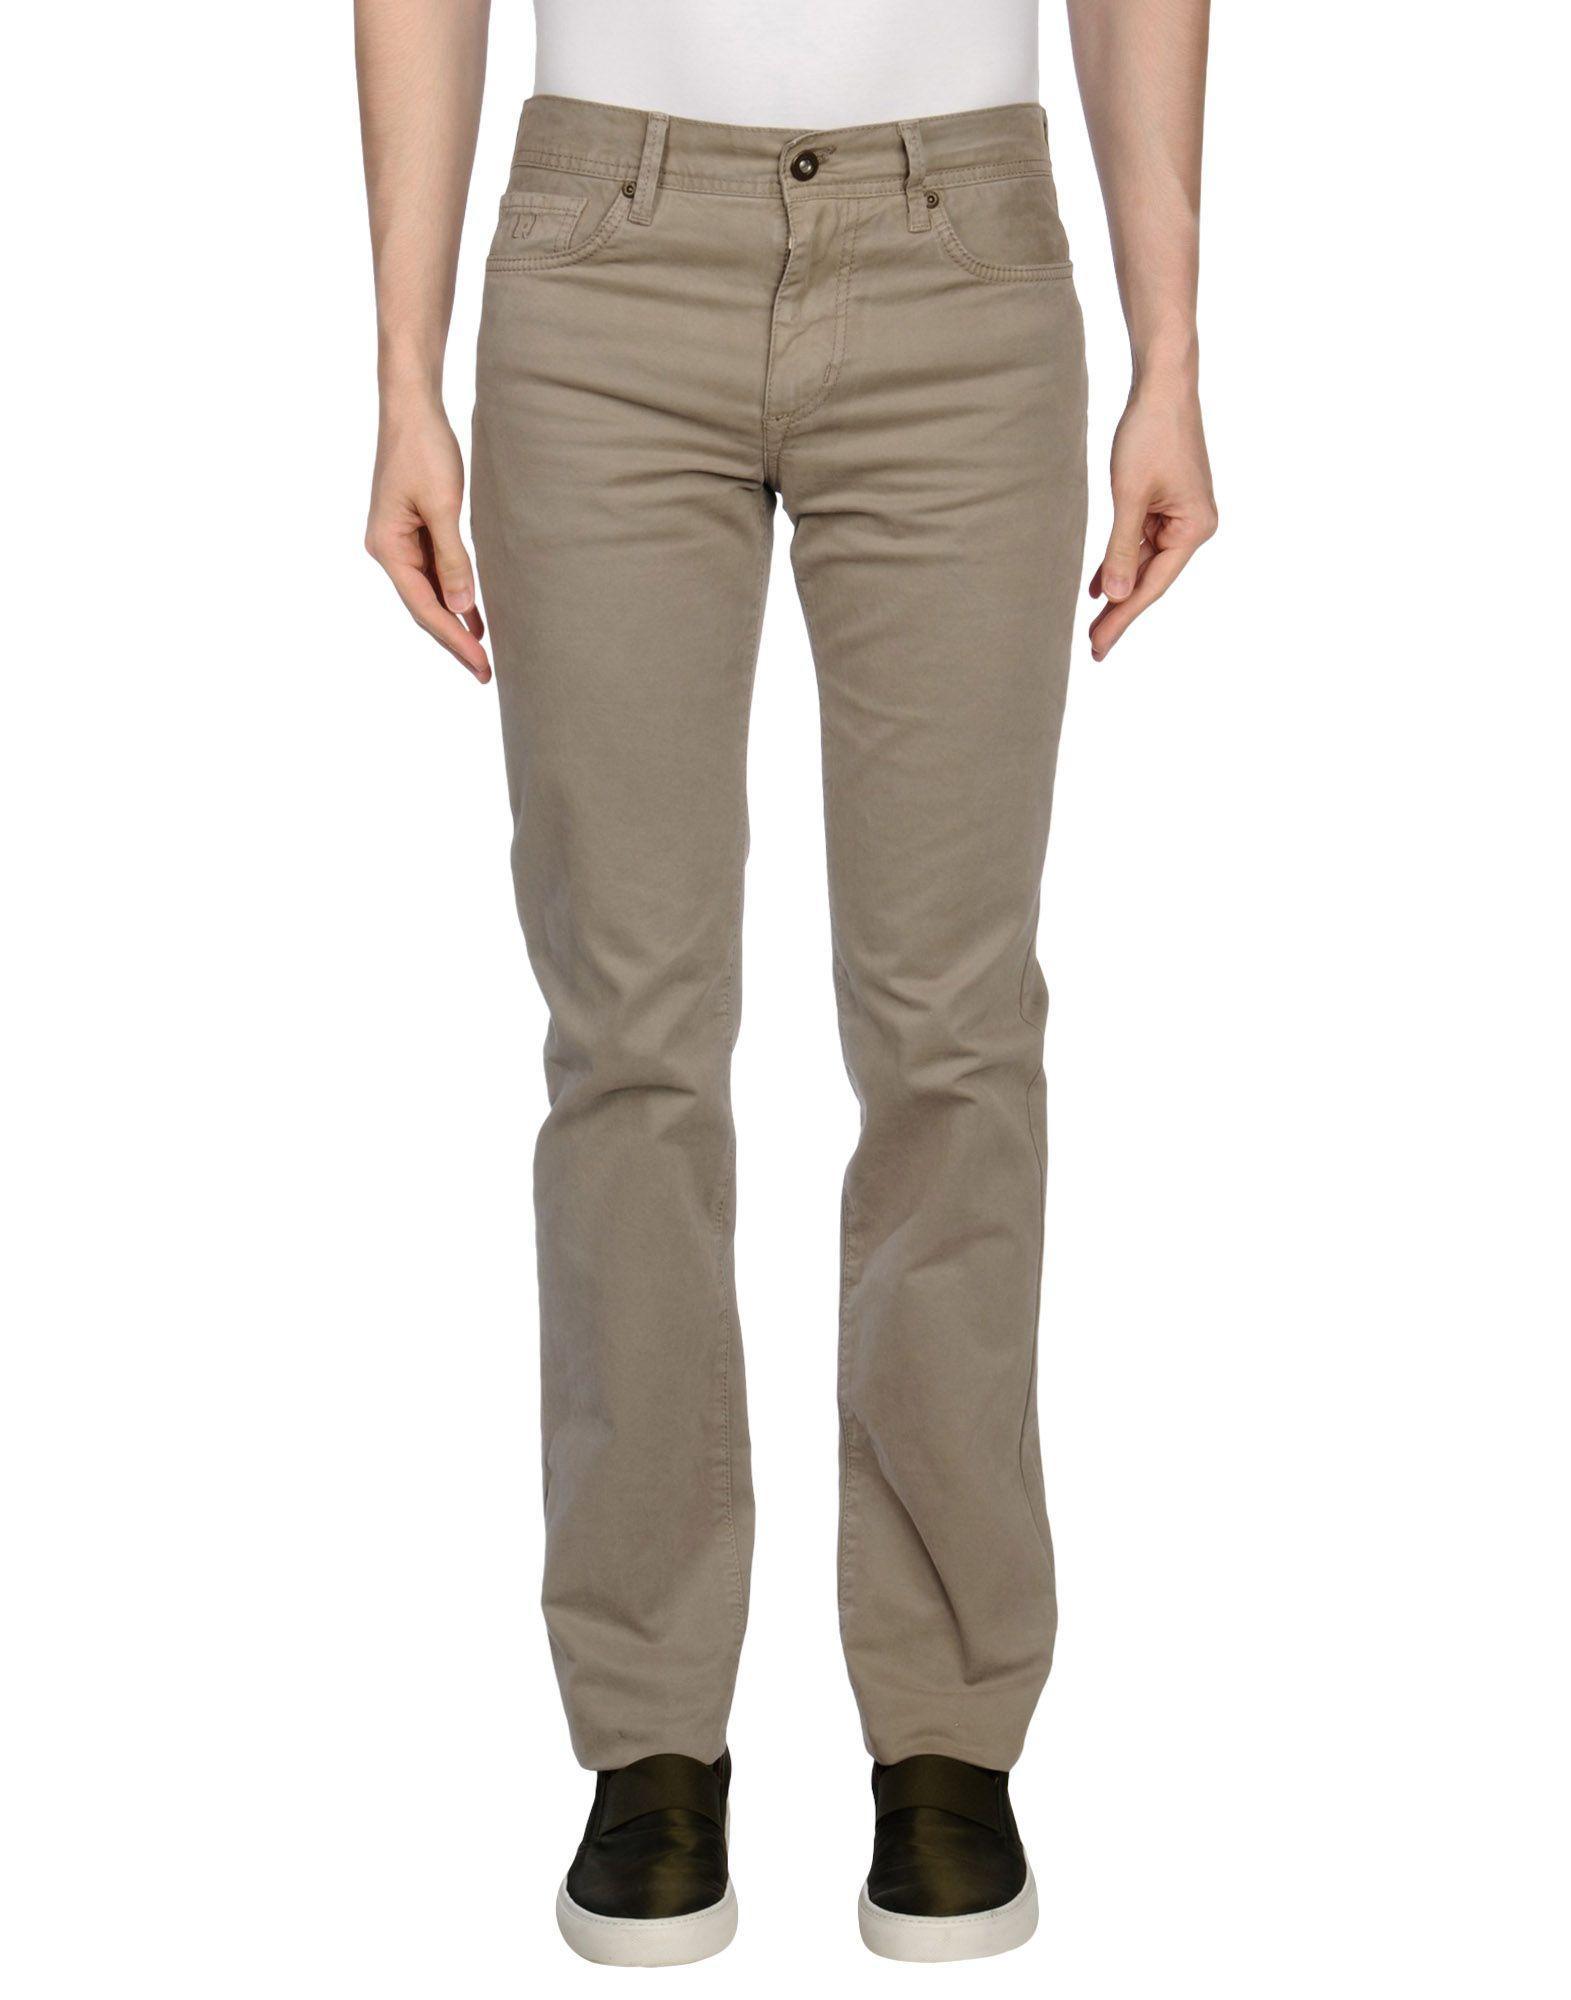 Liu •jo Casual Pants In Dove Grey